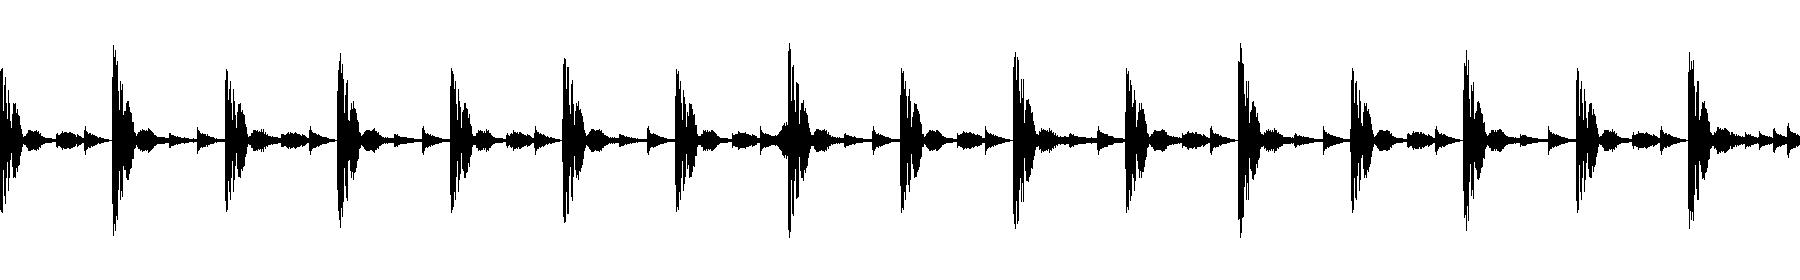 104 drums 02 sp